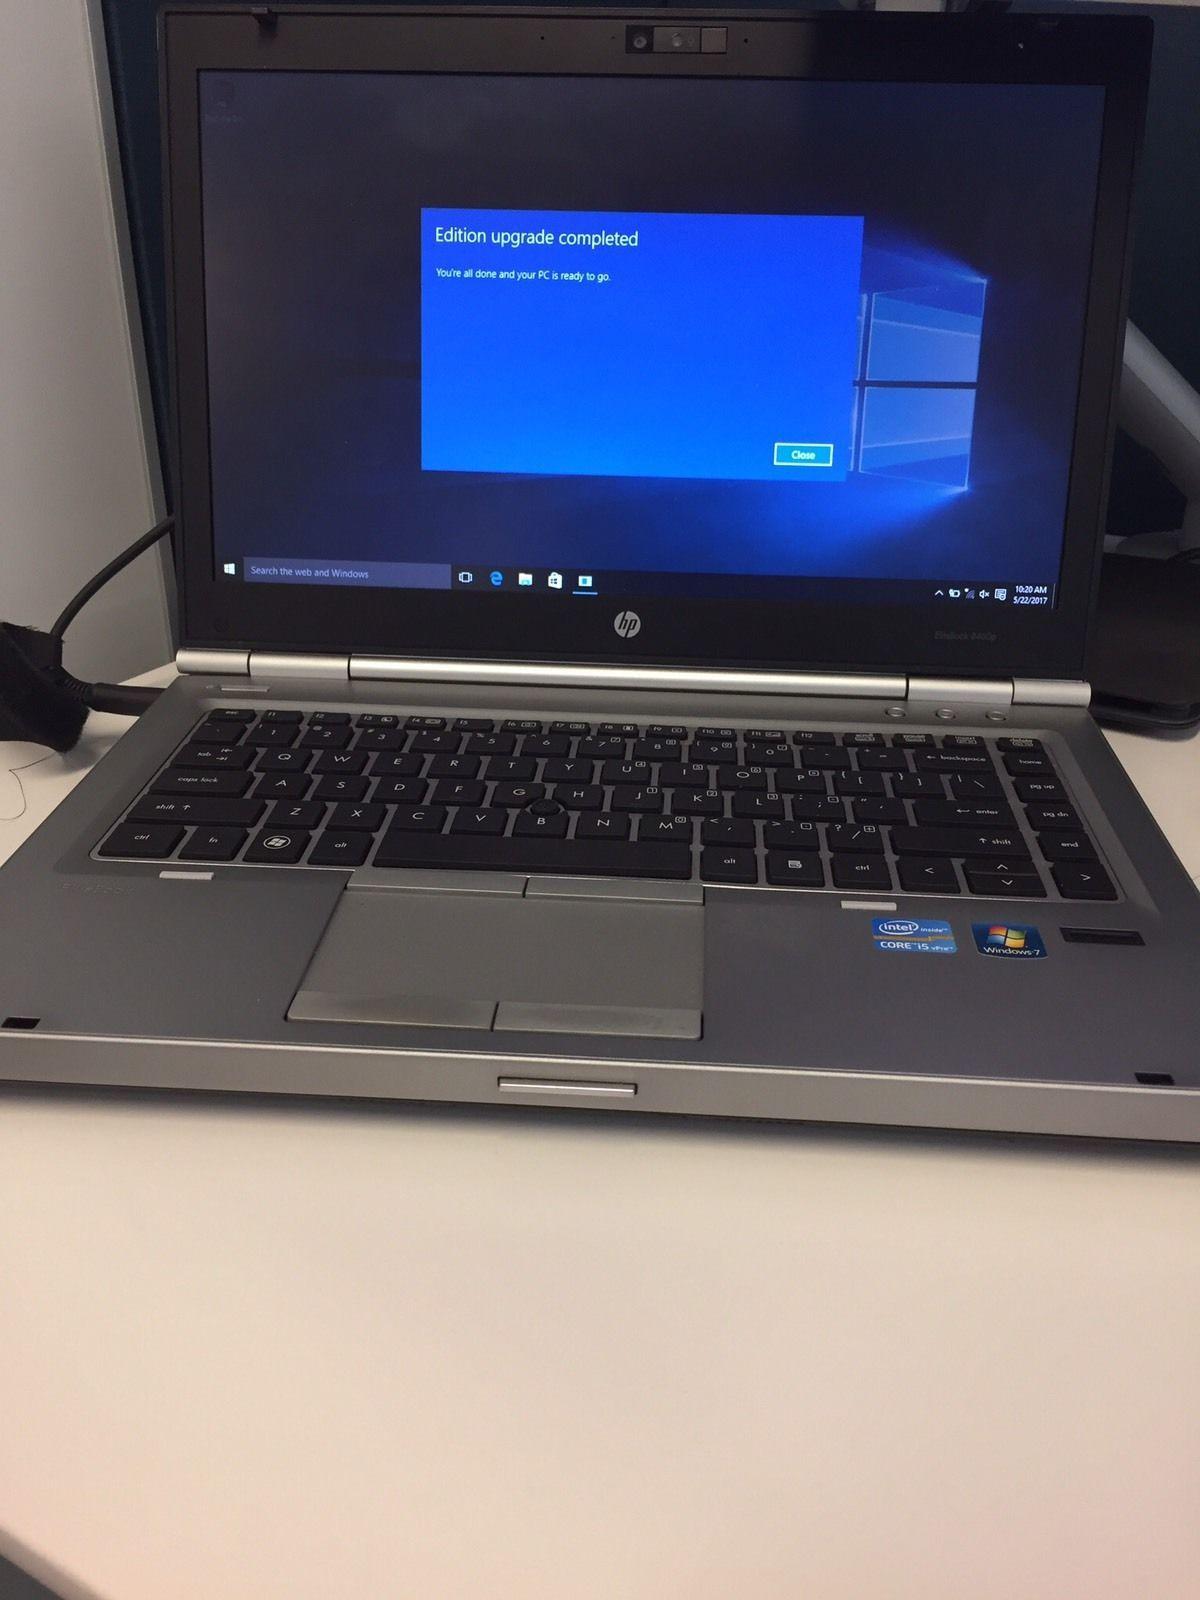 HP EliteBook 8460p Core i5-2520M 2 50GHz 16GB RAM 700GB HDD Webcam